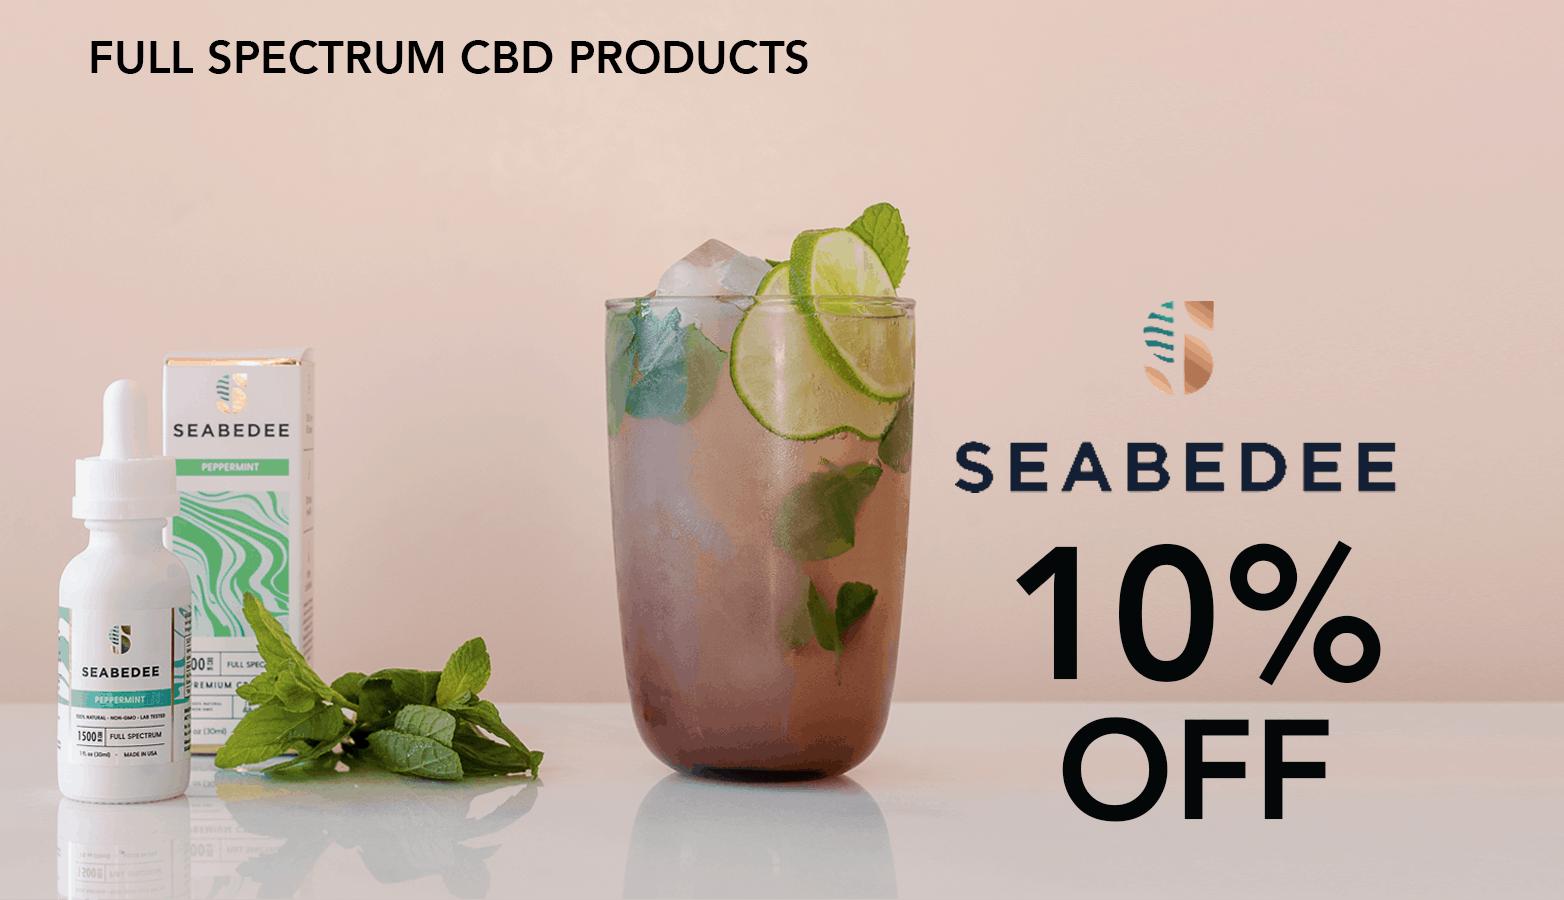 Seabedee CBD Coupon Code Offer Website